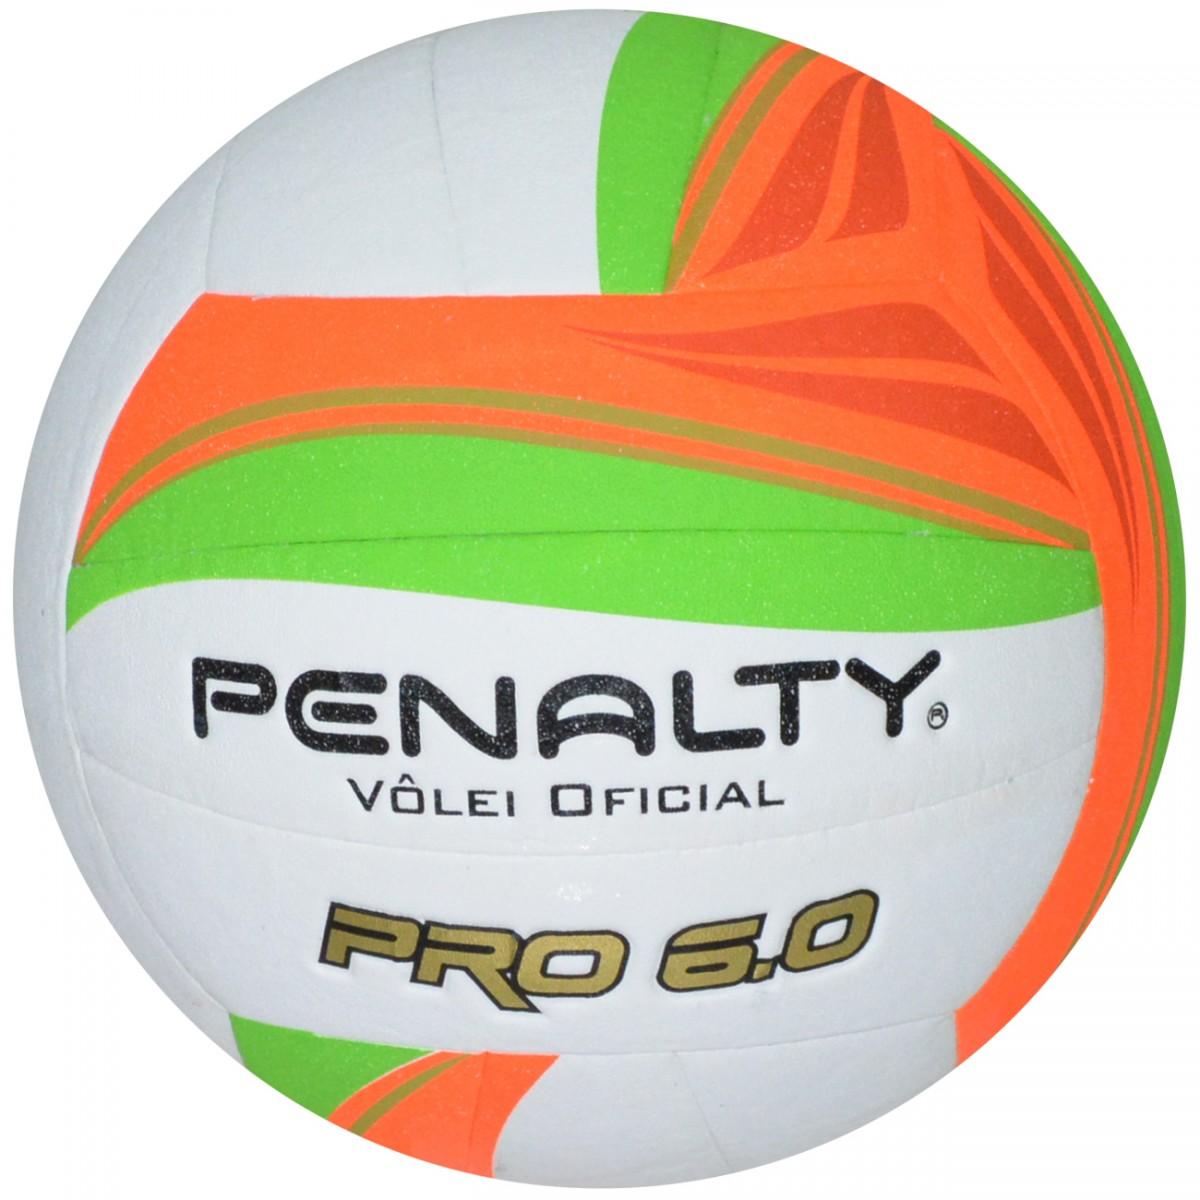 Bola Penalty Volei Pro 6.0 5211661790 - Branco Laranja Verde - Chuteira  Nike 40eeec7789a69